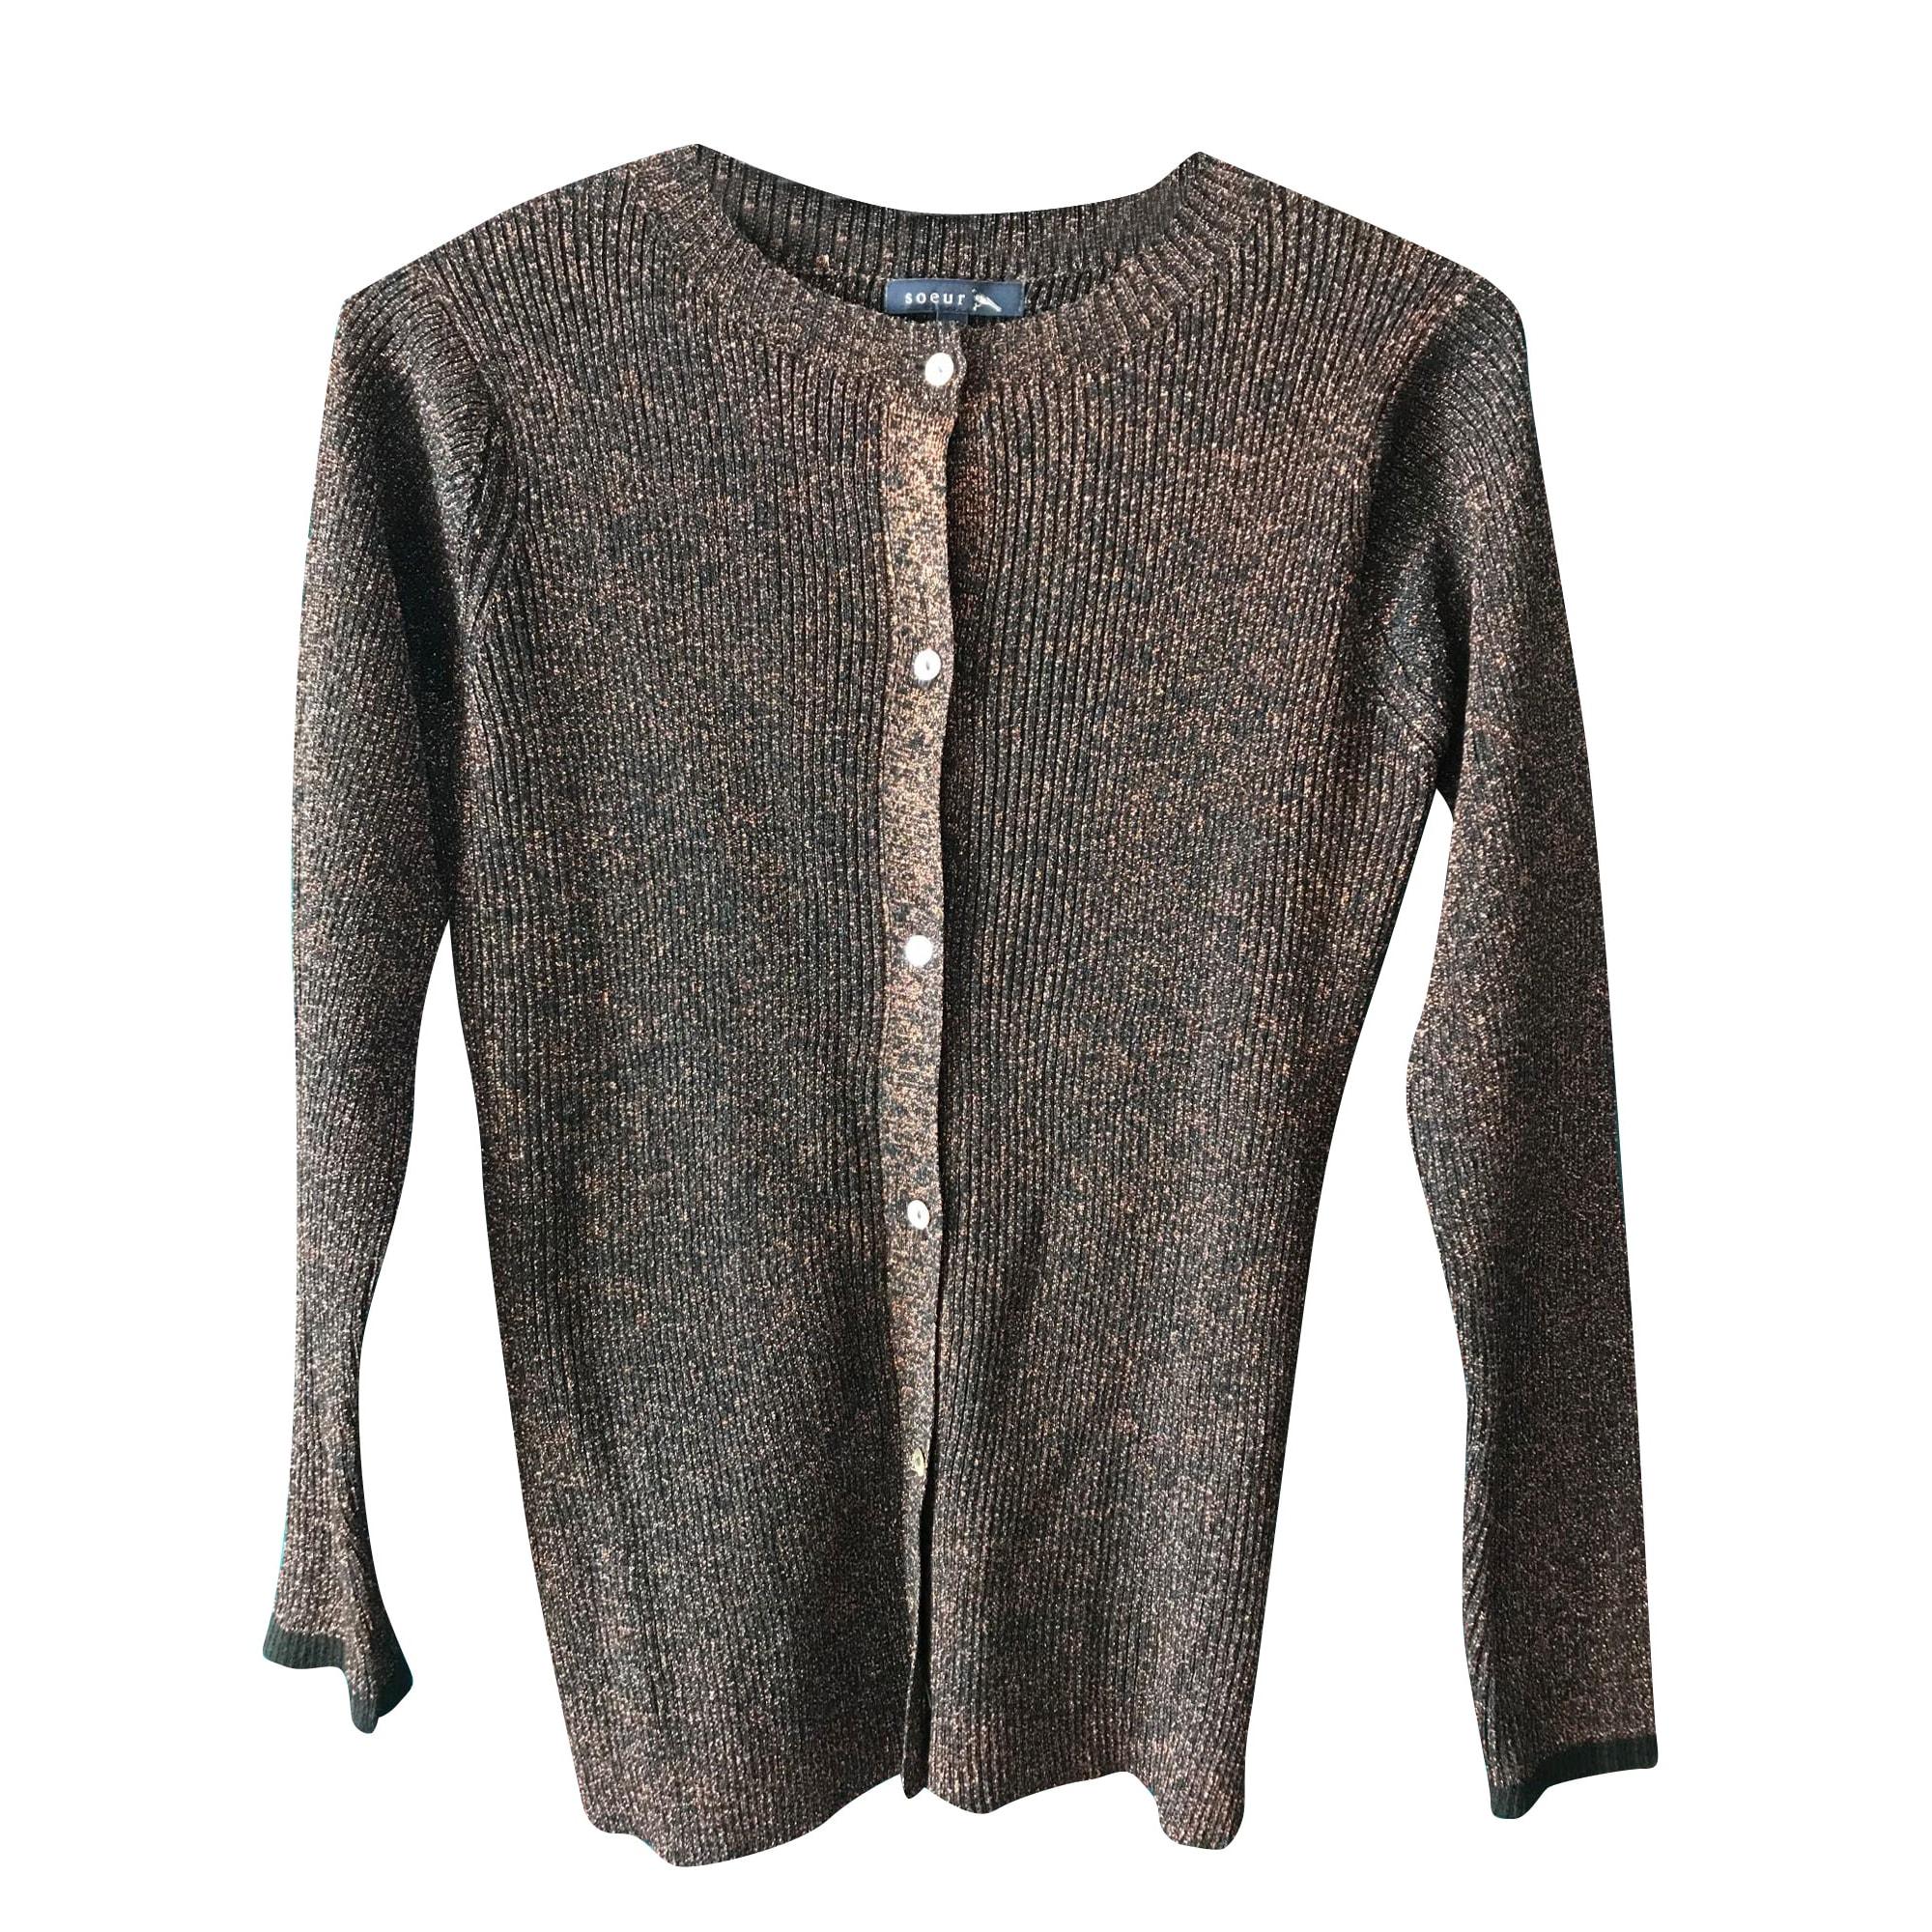 Gilet, cardigan SOEUR Noir et lurex bronze